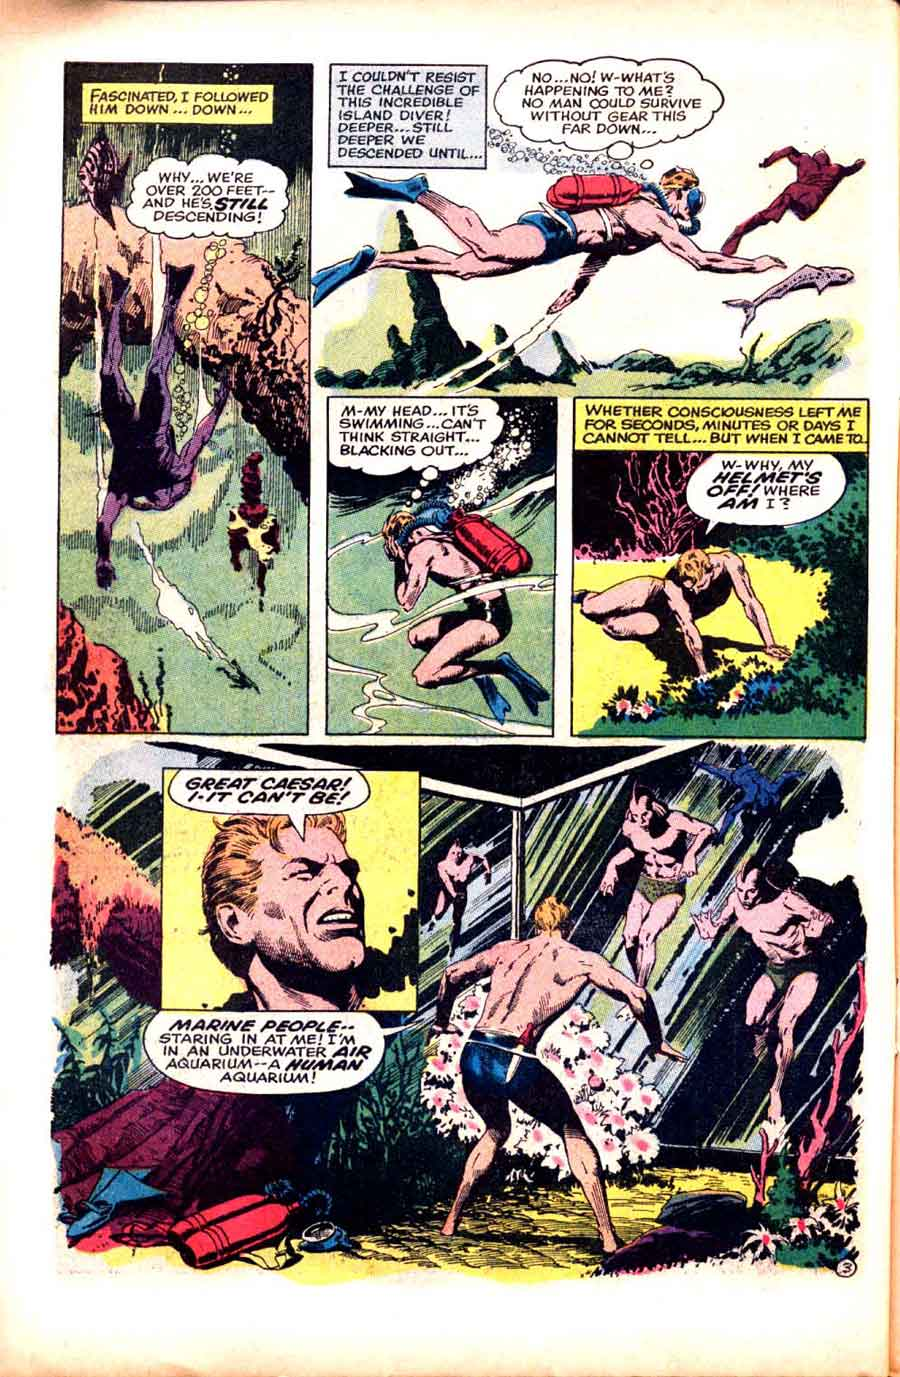 Alarming Adventures v1 #2 harvey 1960s silver age comic book page art by Al Williamson